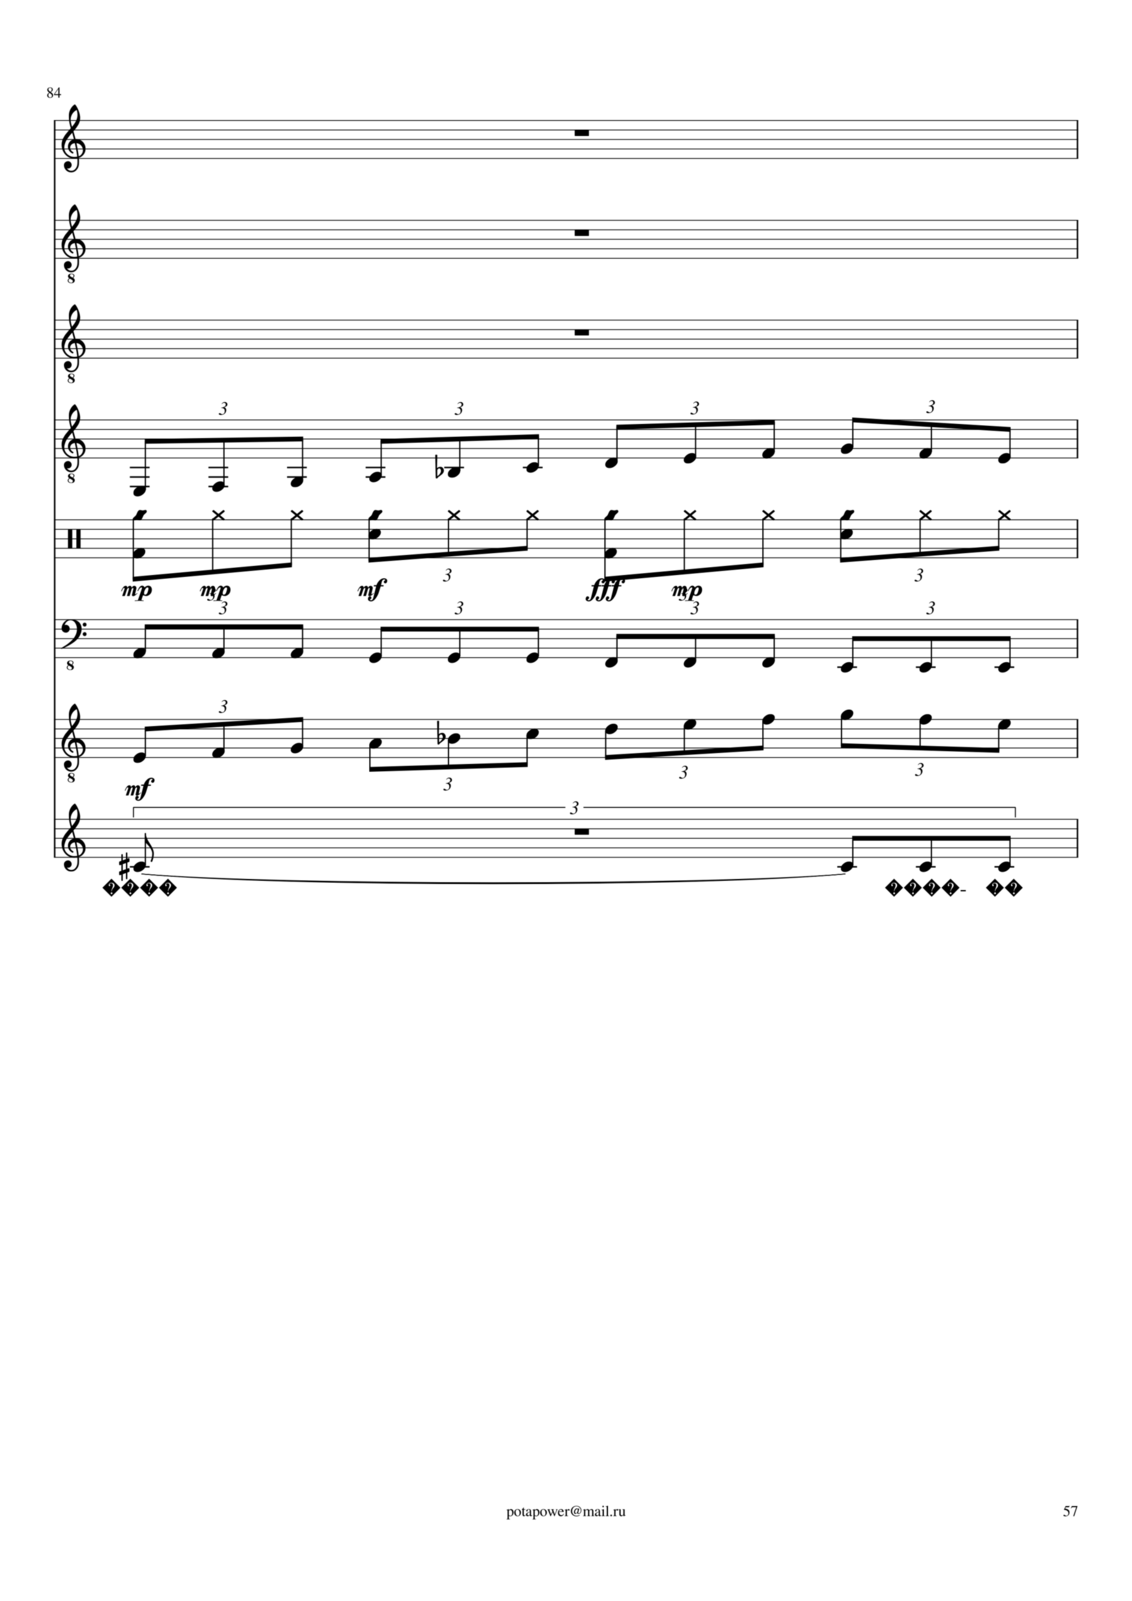 Korolevstvo slez slide, Image 57